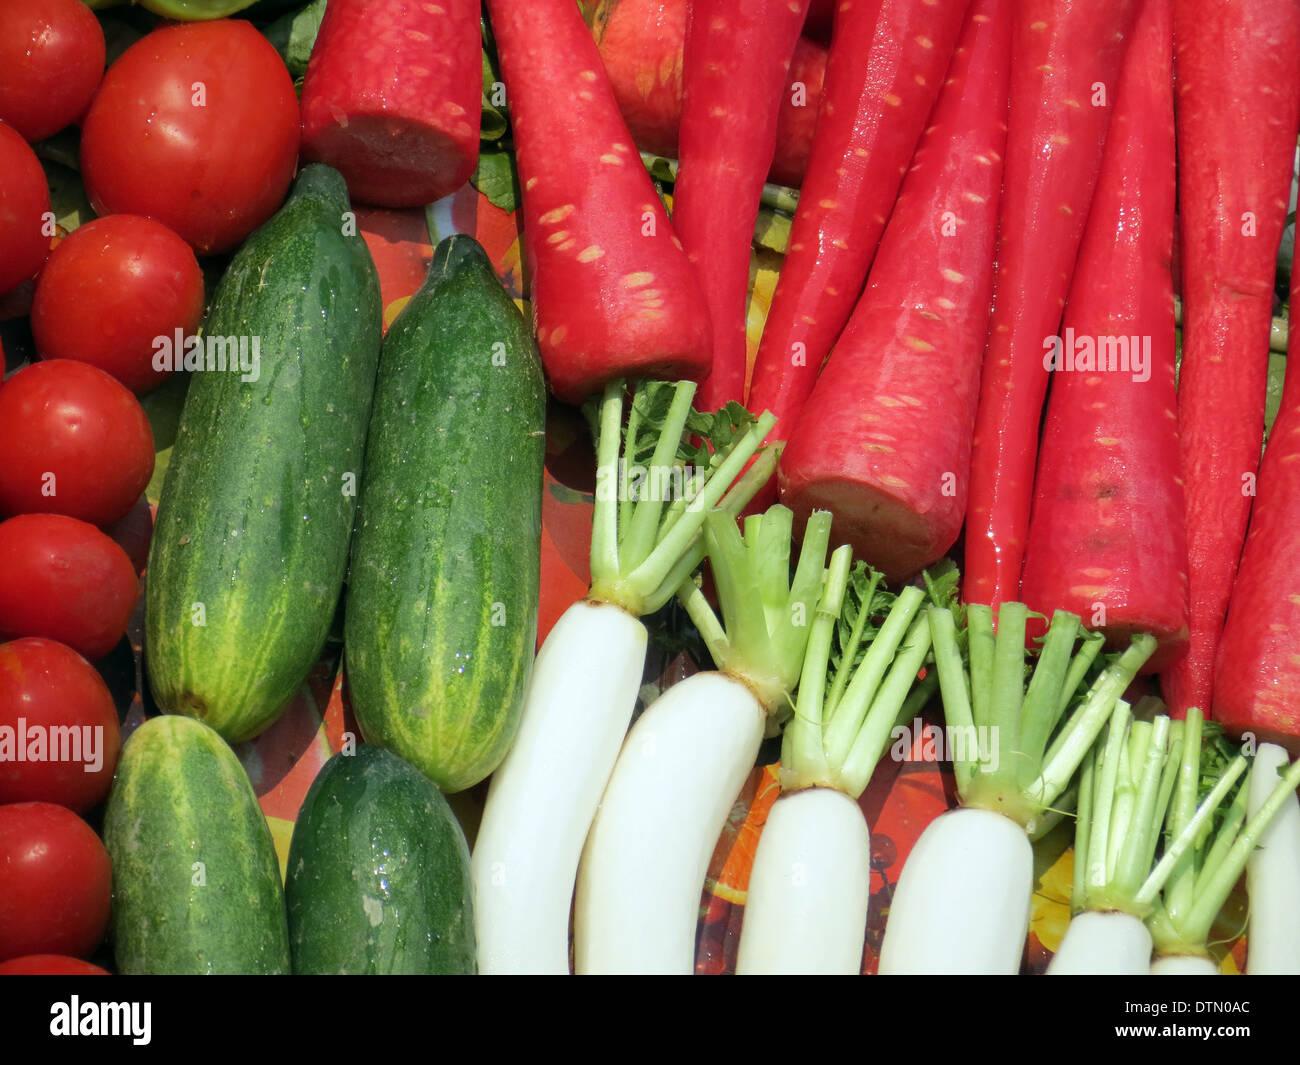 fresh vegetable veggies winter raw food farm tomato carrot radish cucumber - Stock Image